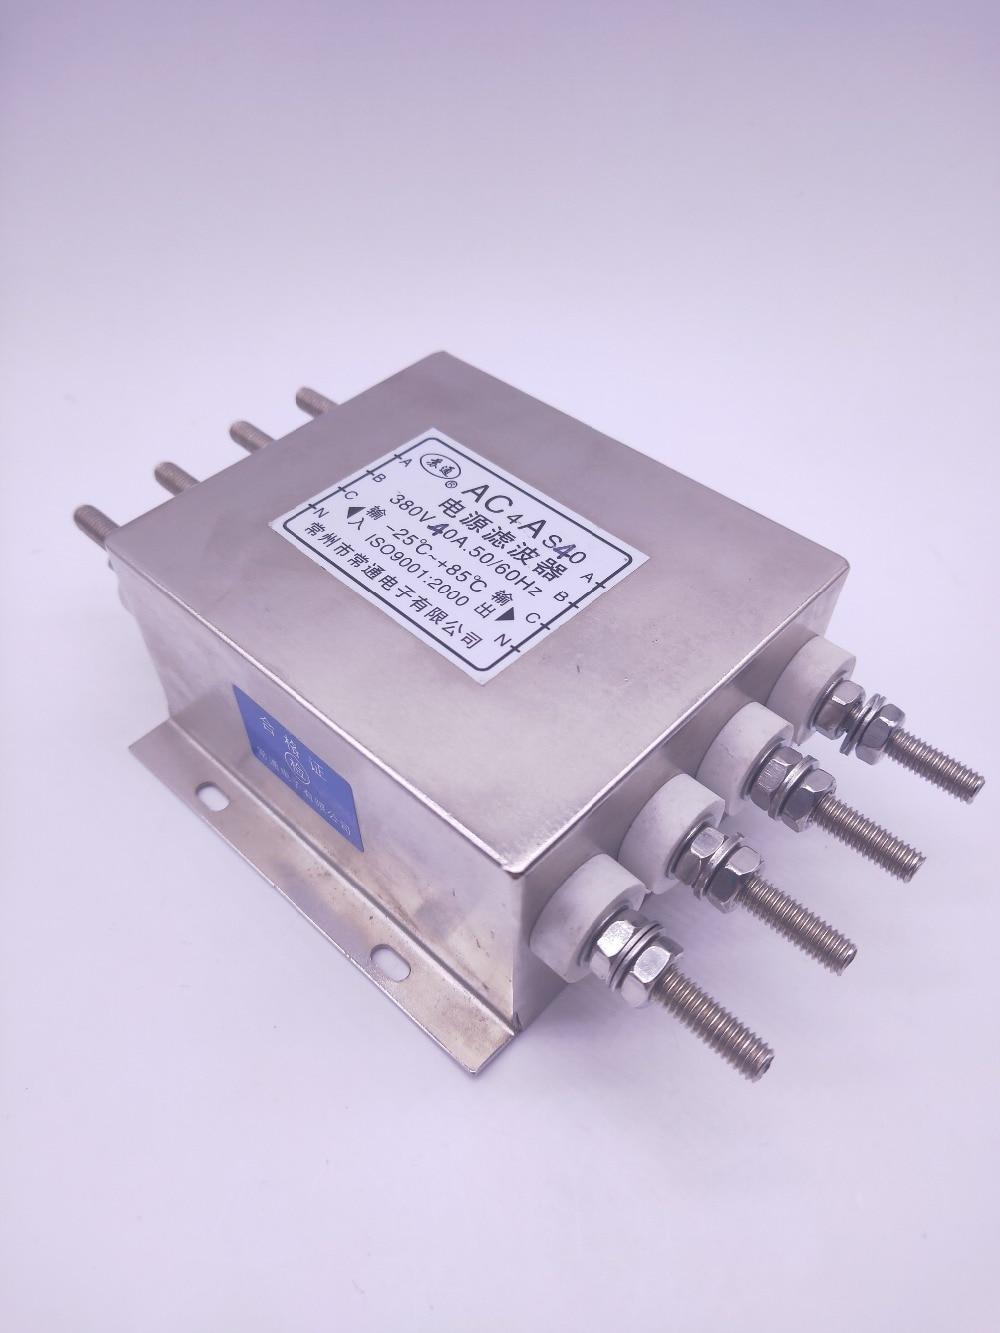 Filtro de potencia EMI 220v 3 fases 4 Cable 30A AC4AS40 conector